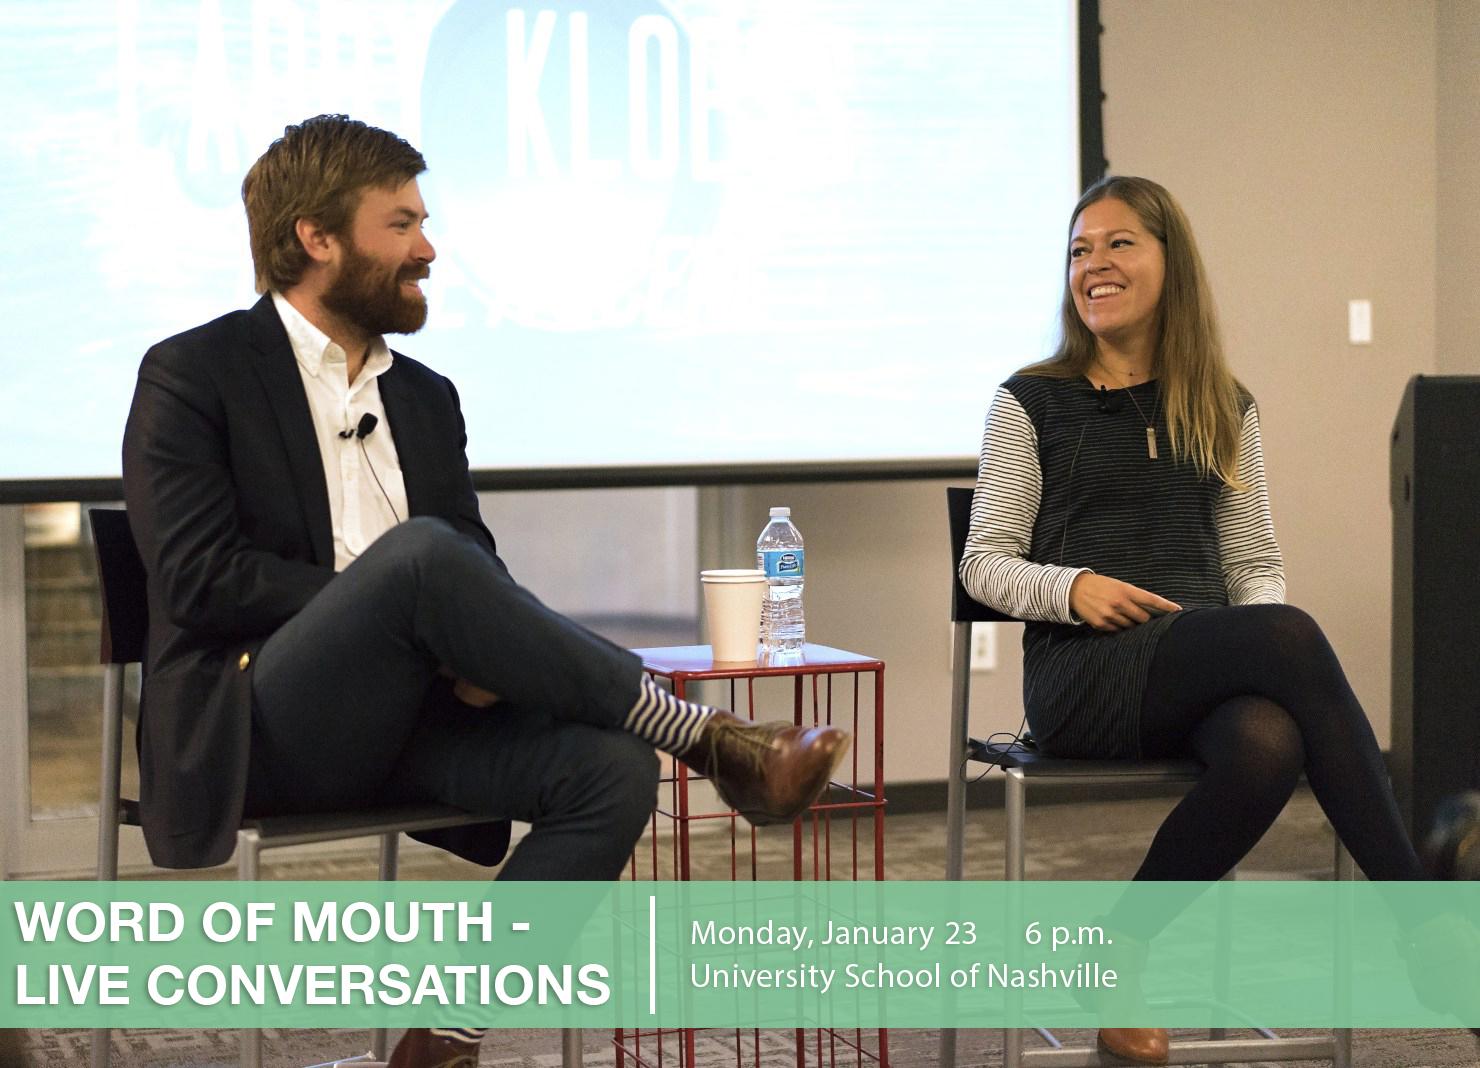 Live Conversation at the University School of Nashville